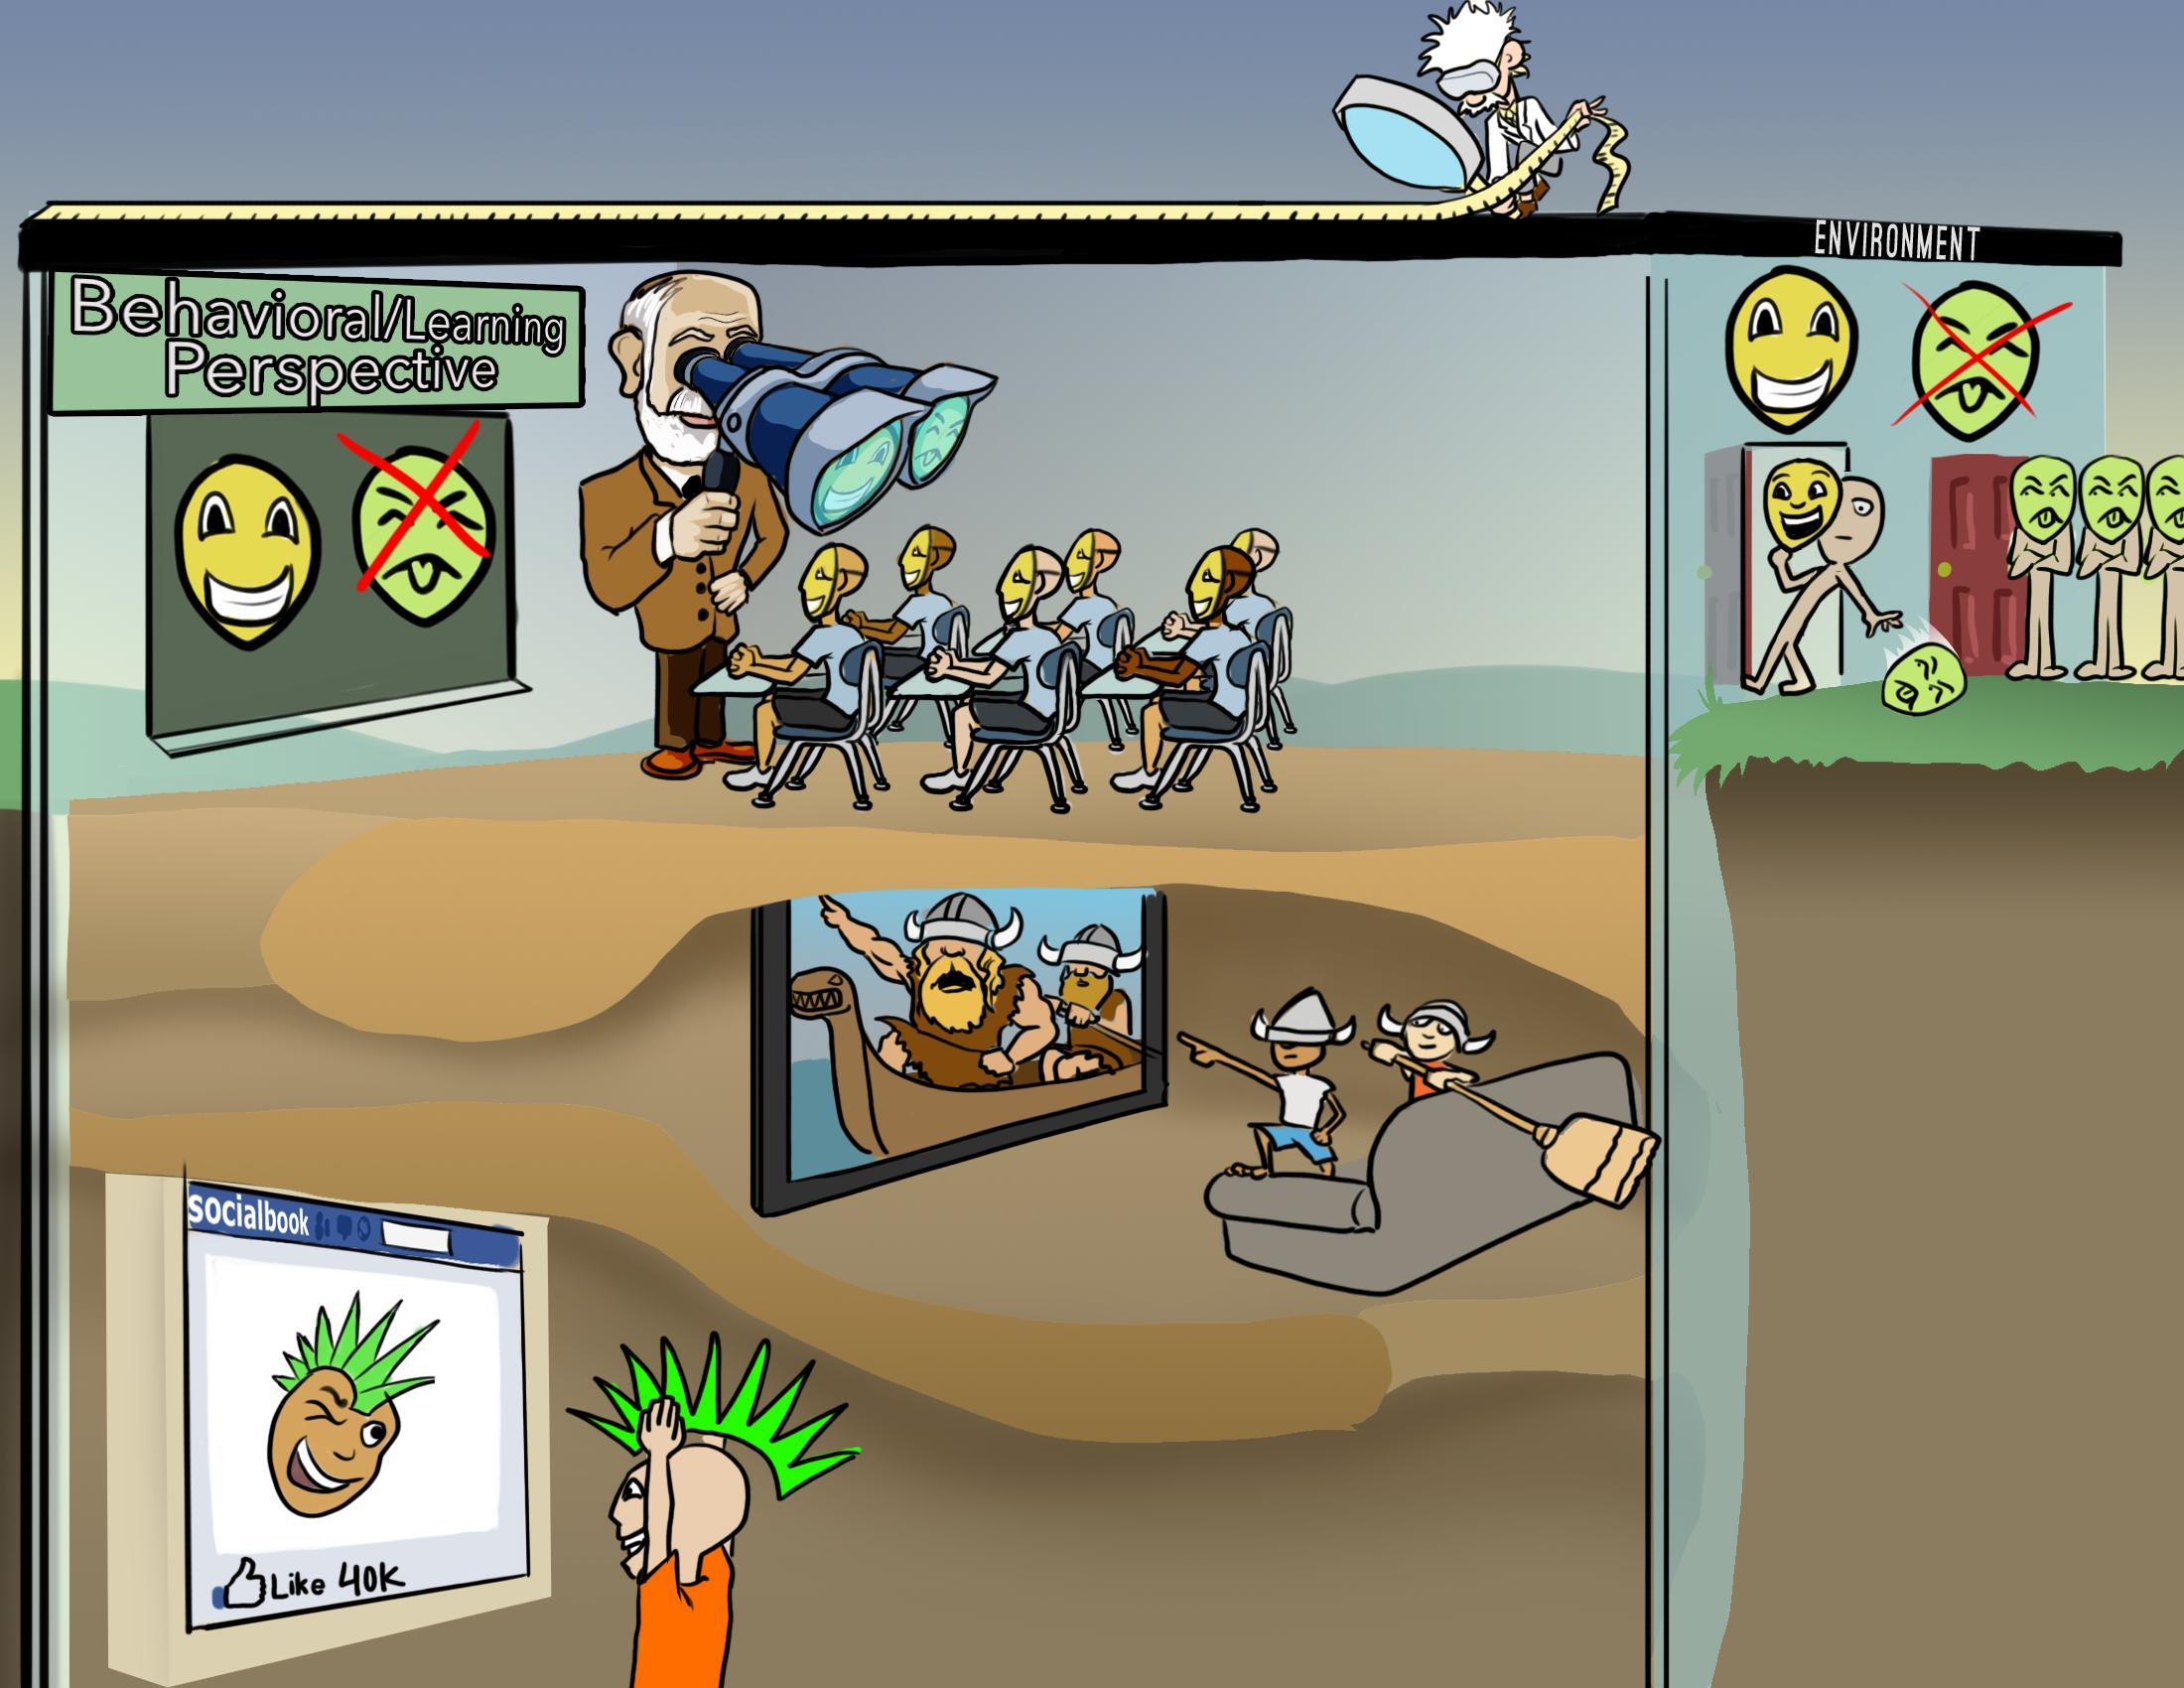 Behavioral/Learning Perspective of Human Behavior